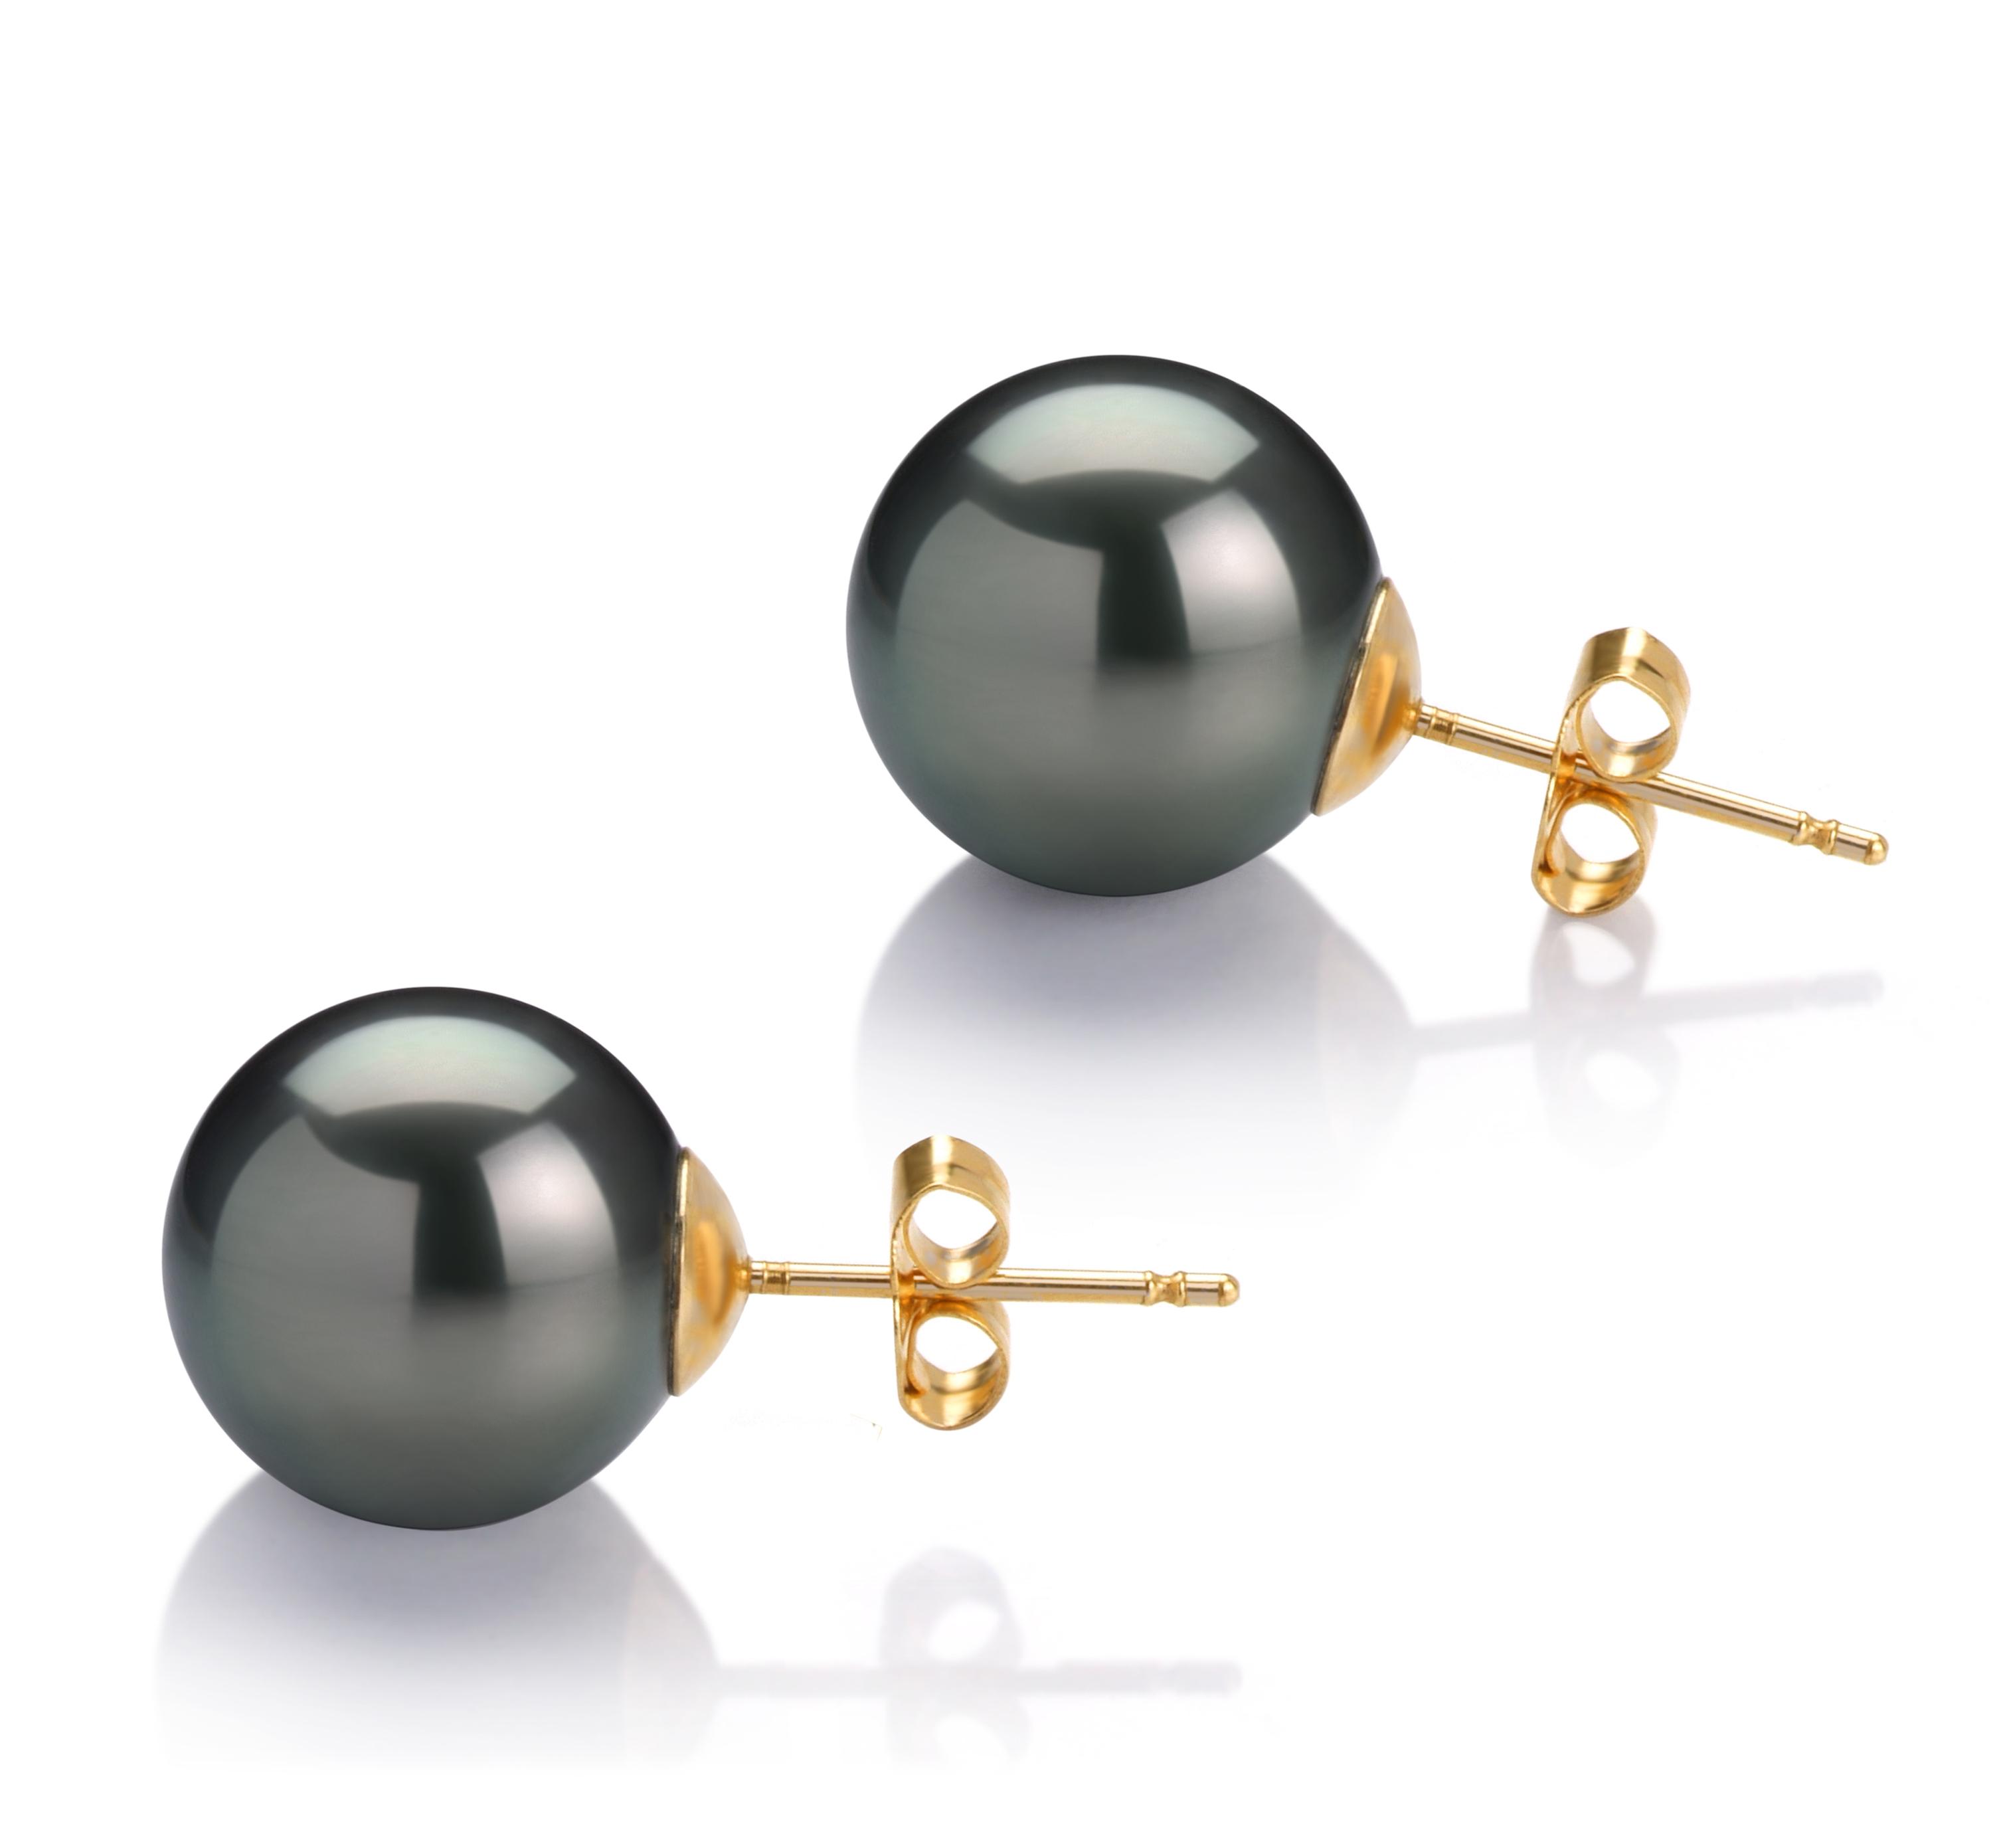 11-12mm AAA-Qualität Tahitisch Paar Ohrringe in Schwarz